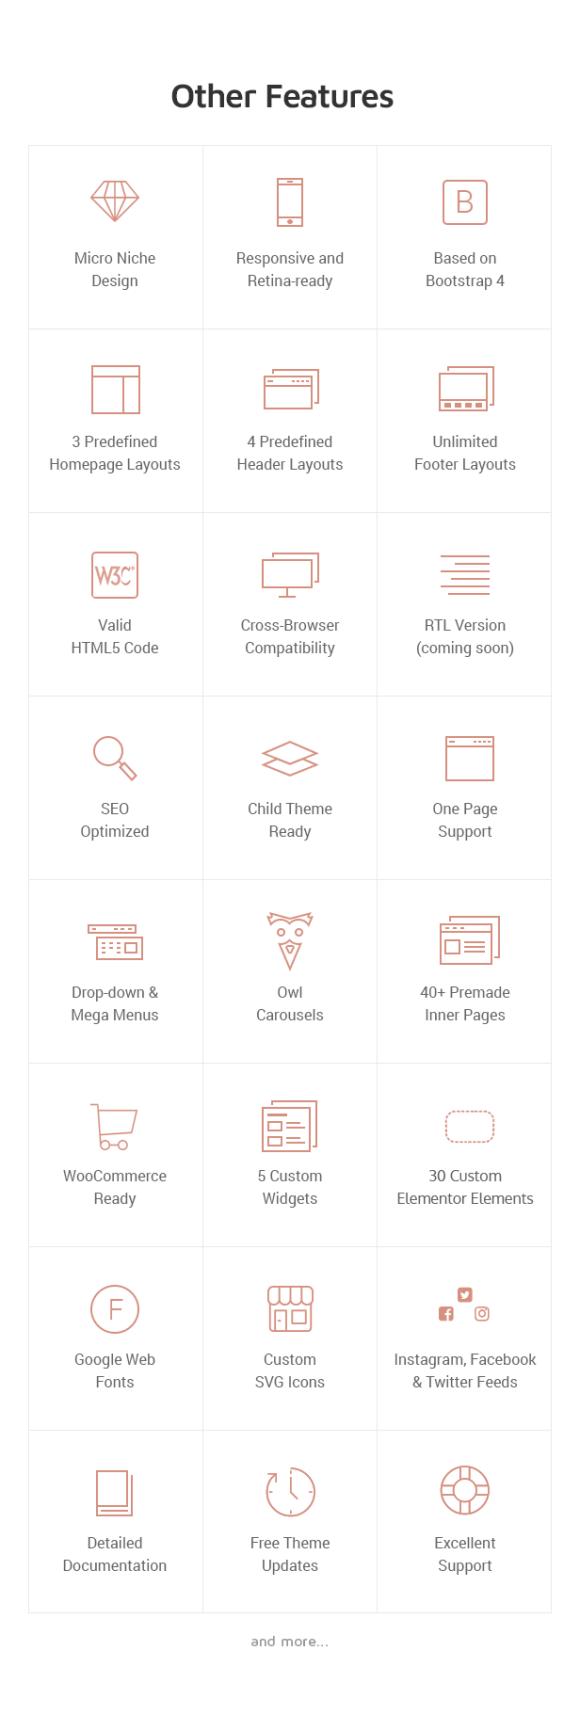 Kunstwerk - Handycraft Marketplace WordPress Theme - 8